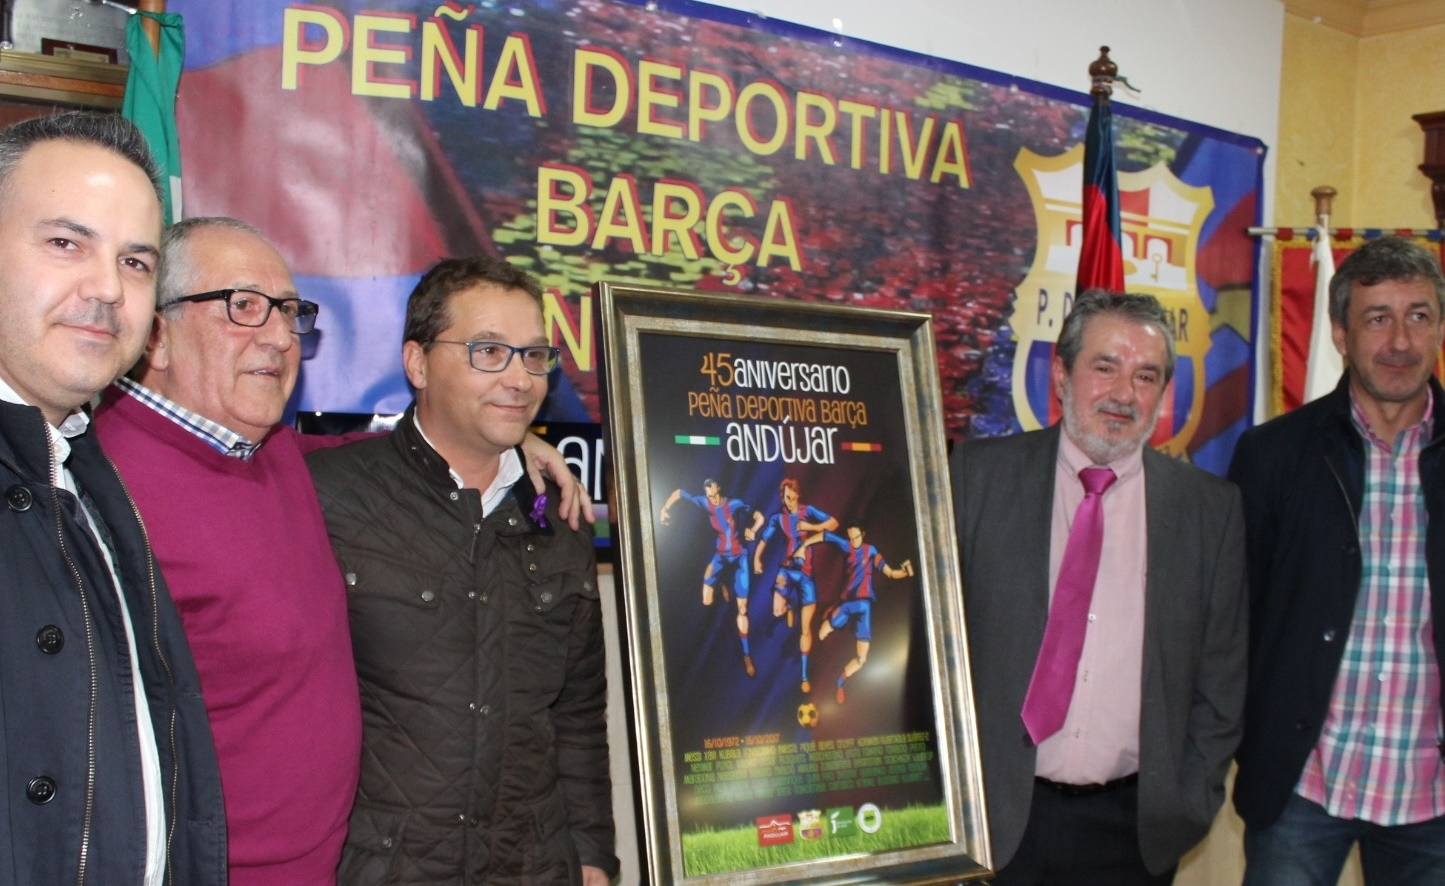 La peña deportiva Barça de Andújar celebra su 45 aniversario